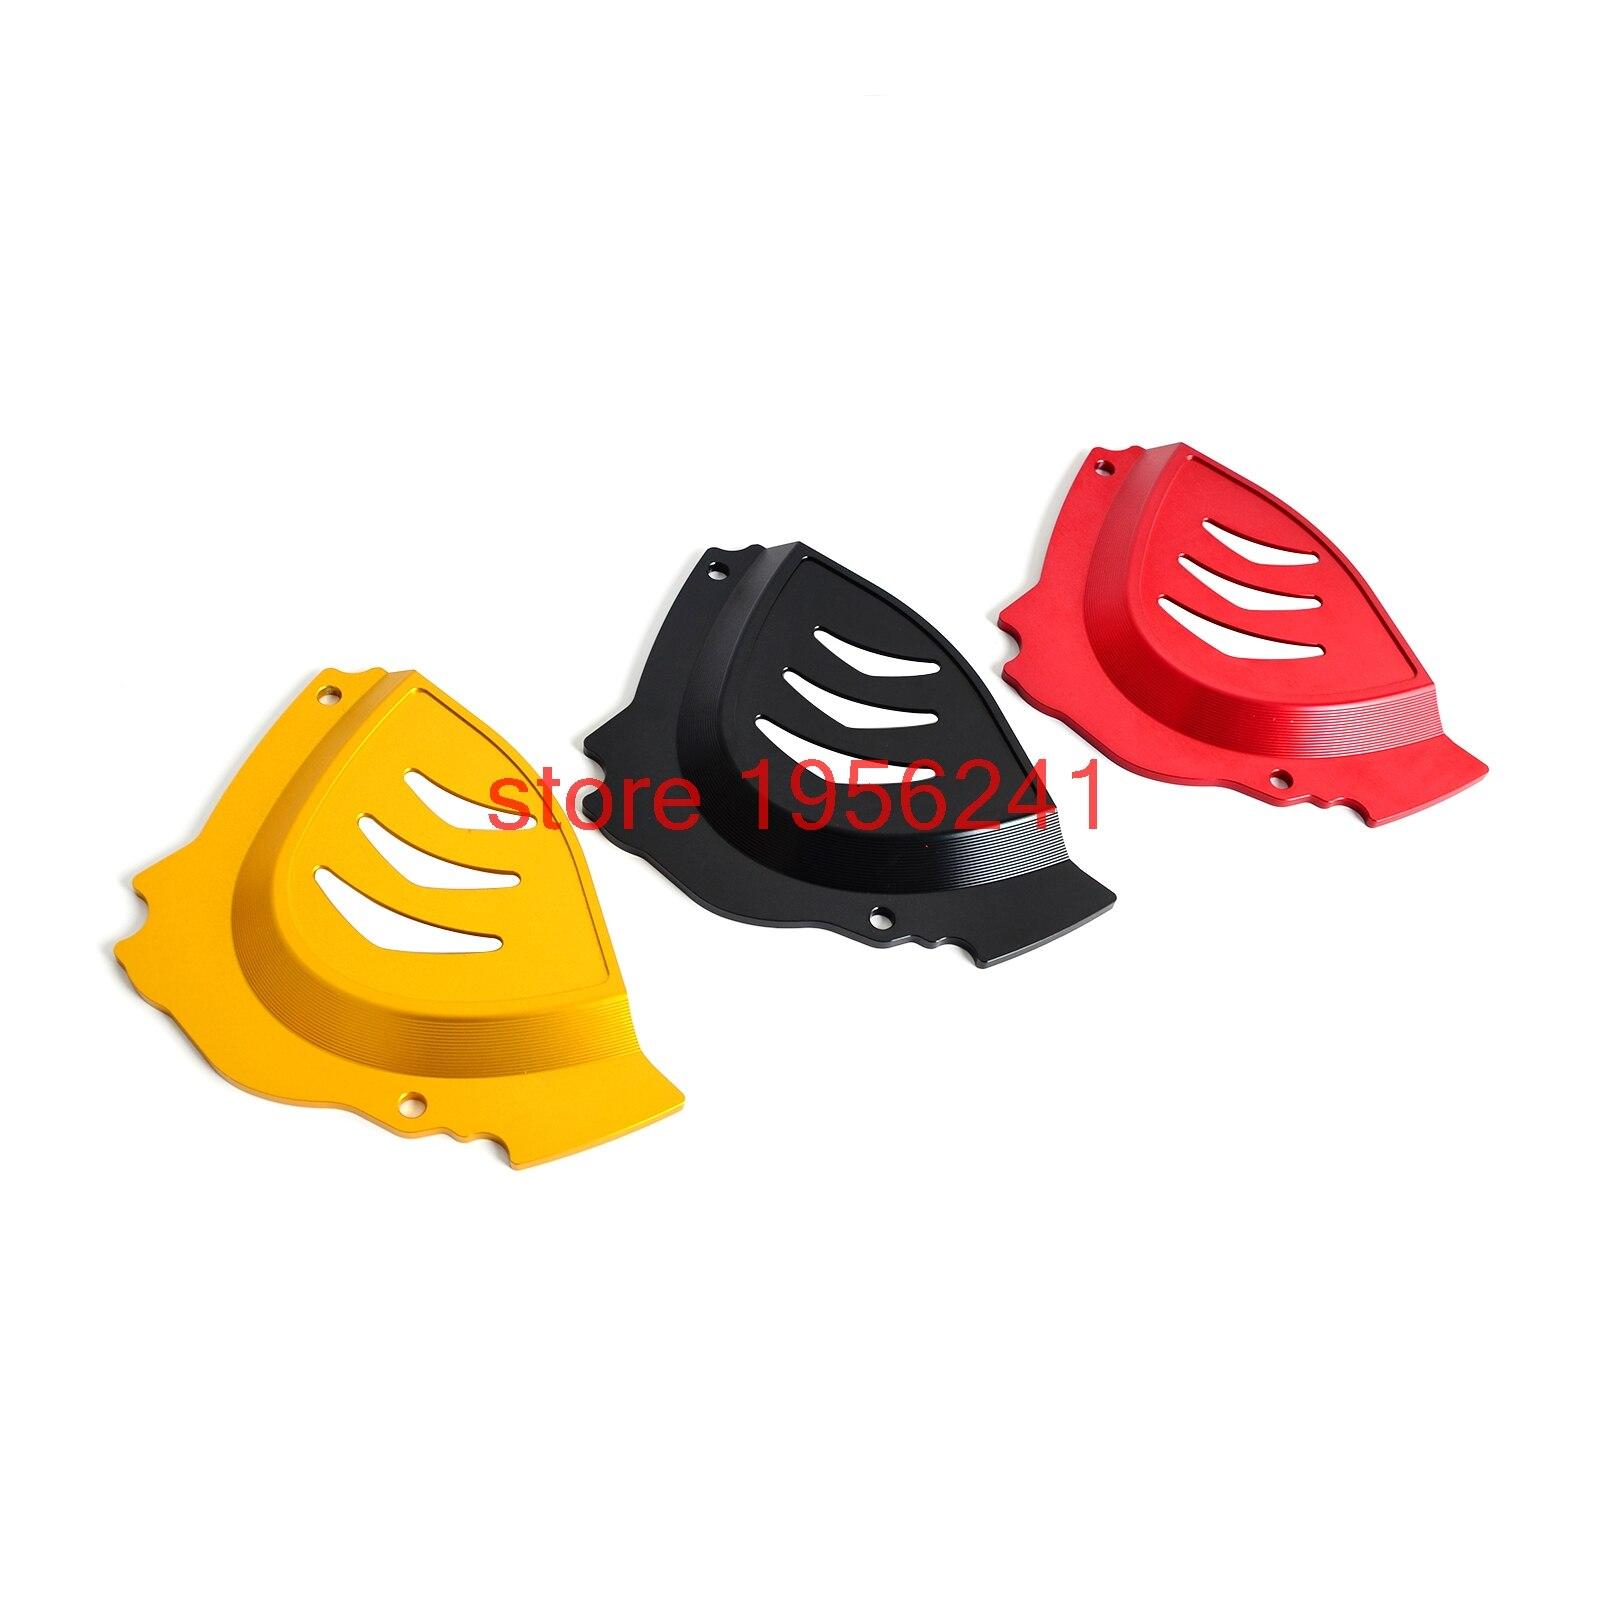 Motorycle Aluminium Parts Chain Cover For Ducati Monster 821 Dark 2014 2015 2016 1200 1200S 2014-2016 NEW motorcycle frame slider fairing guard for ducati monster 821 1200 1200s 2014 2015 2016 2017